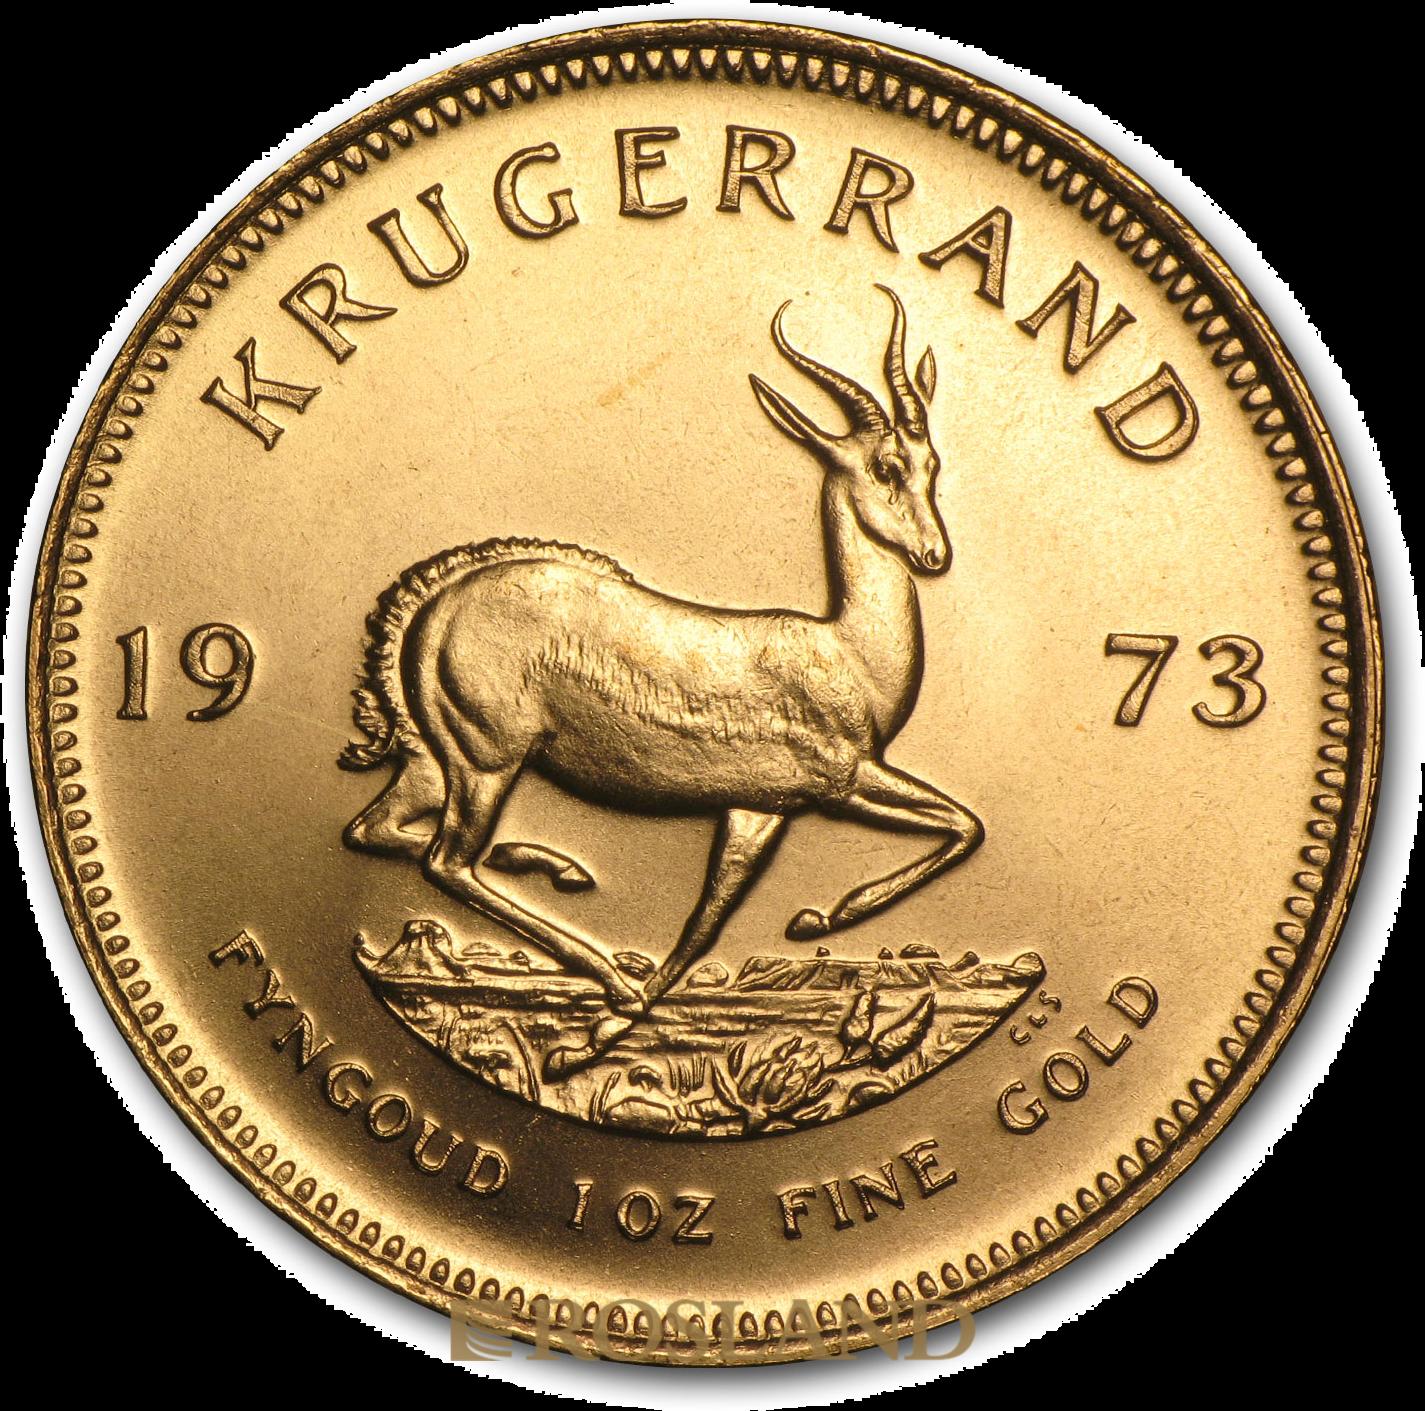 1 Unze Goldmünze Krügerrand 1973